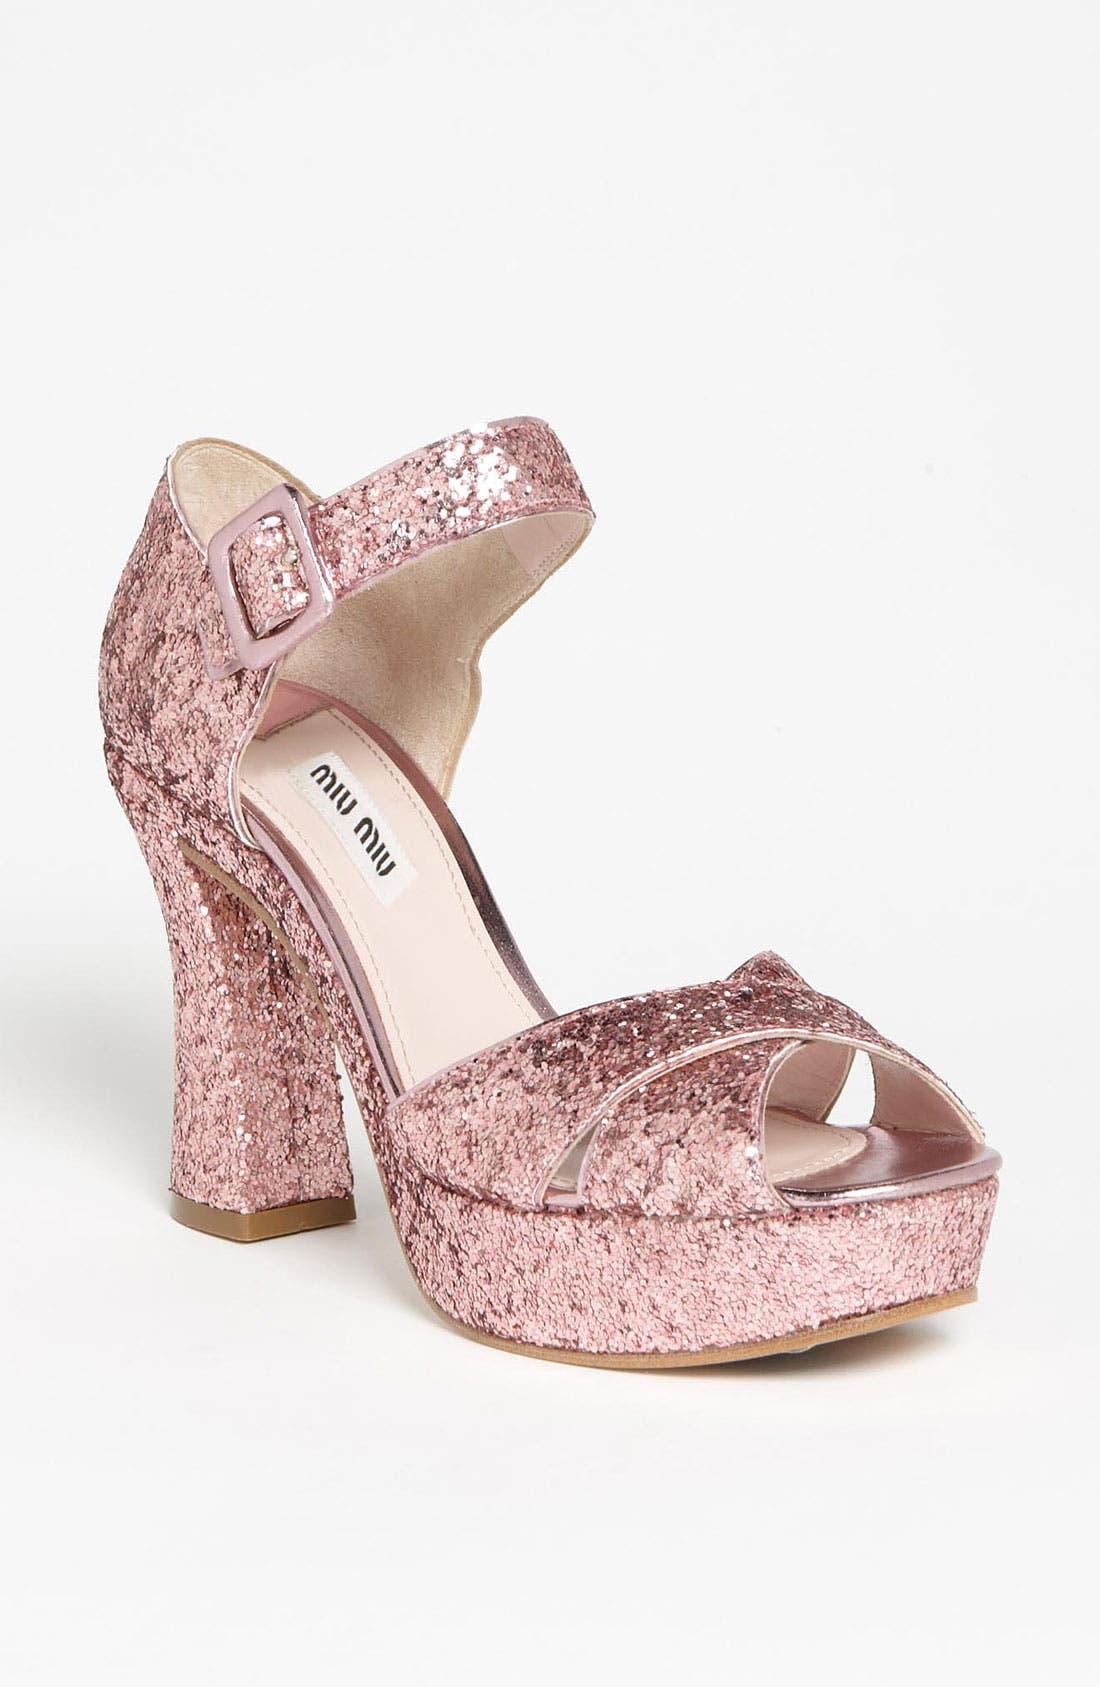 Alternate Image 1 Selected - Miu Miu Glitter Block Heel Sandal